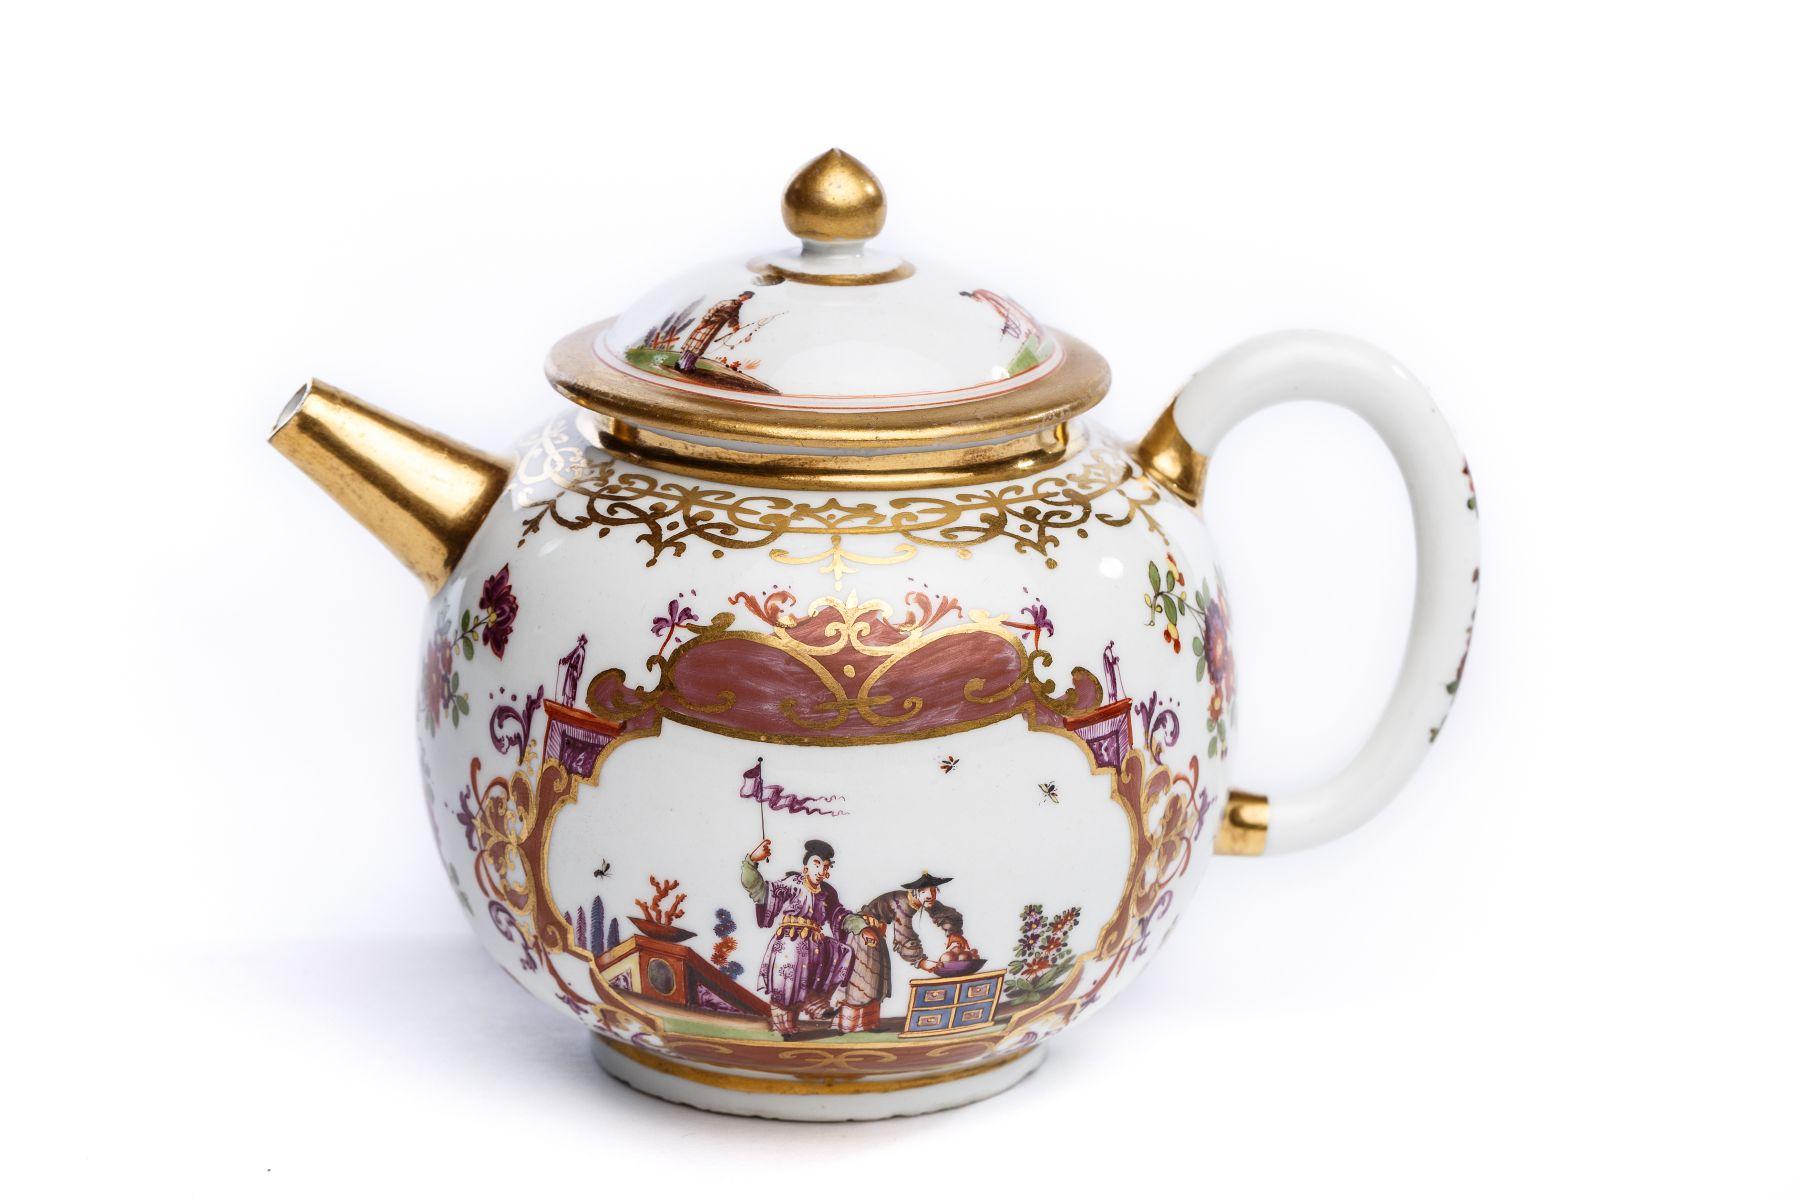 #56 Rare teapot, Meissen 1723/24 | Teekanne, Meissen 1723/24 Image